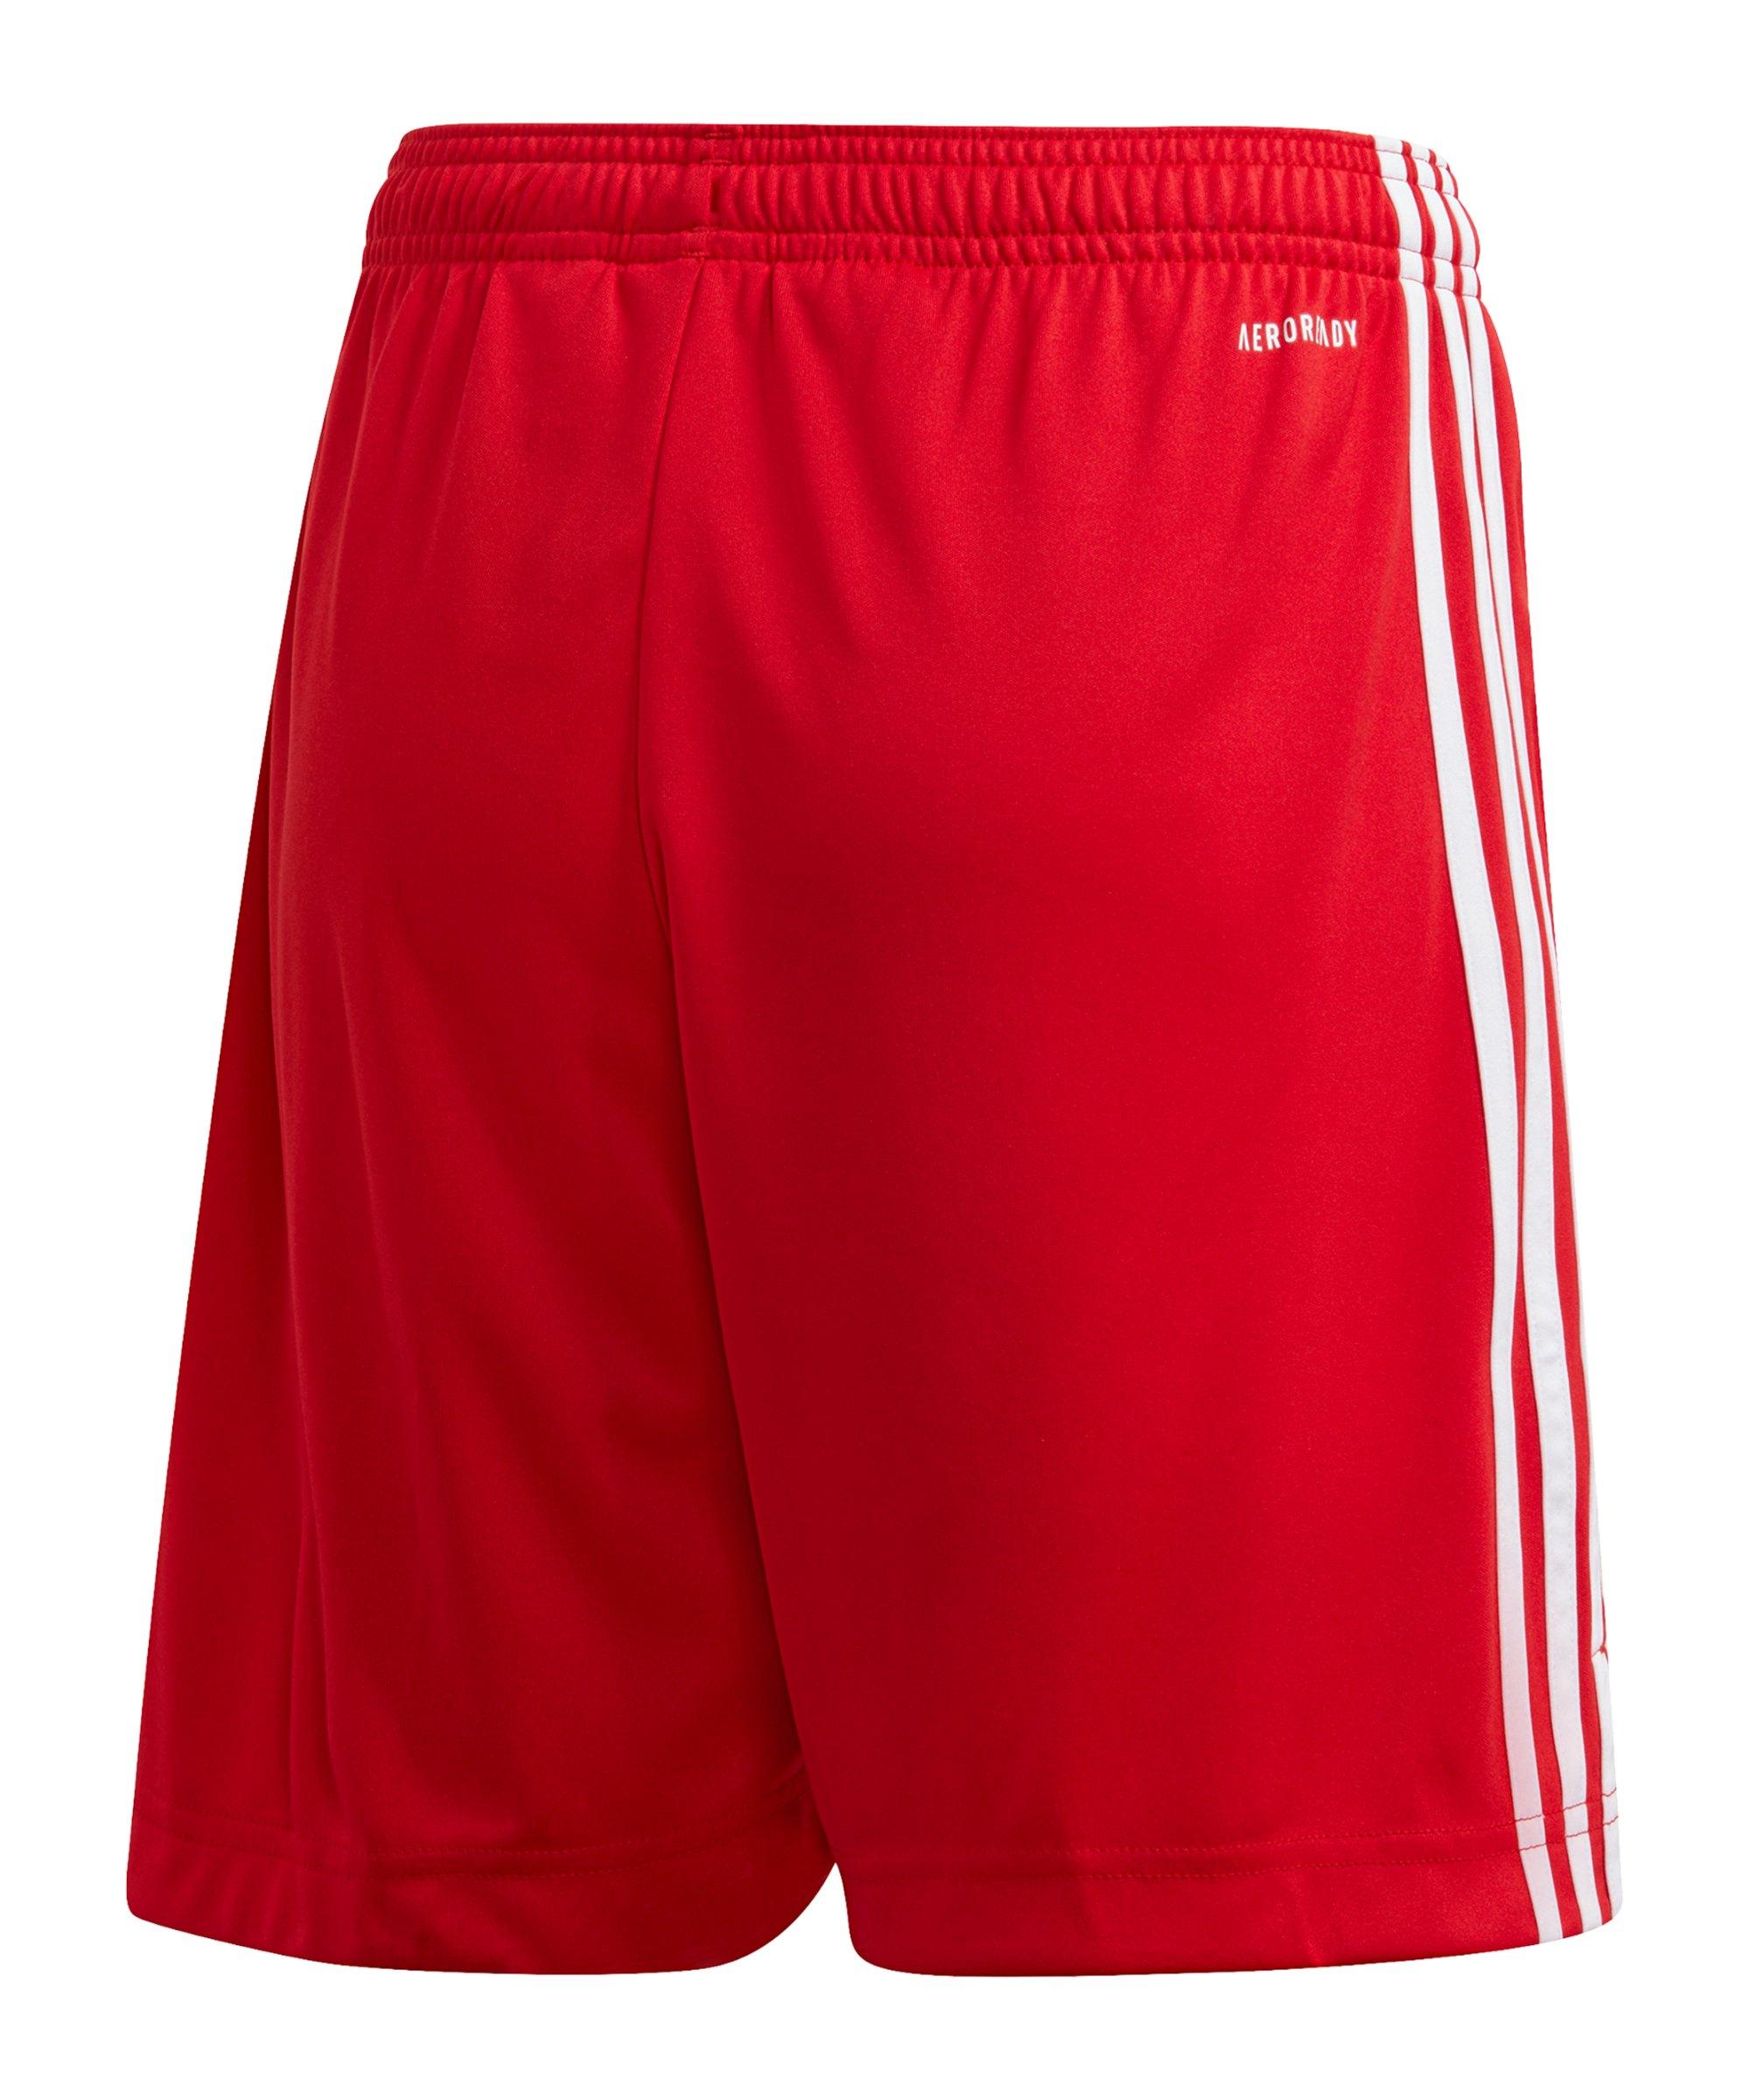 Hsv Shorts